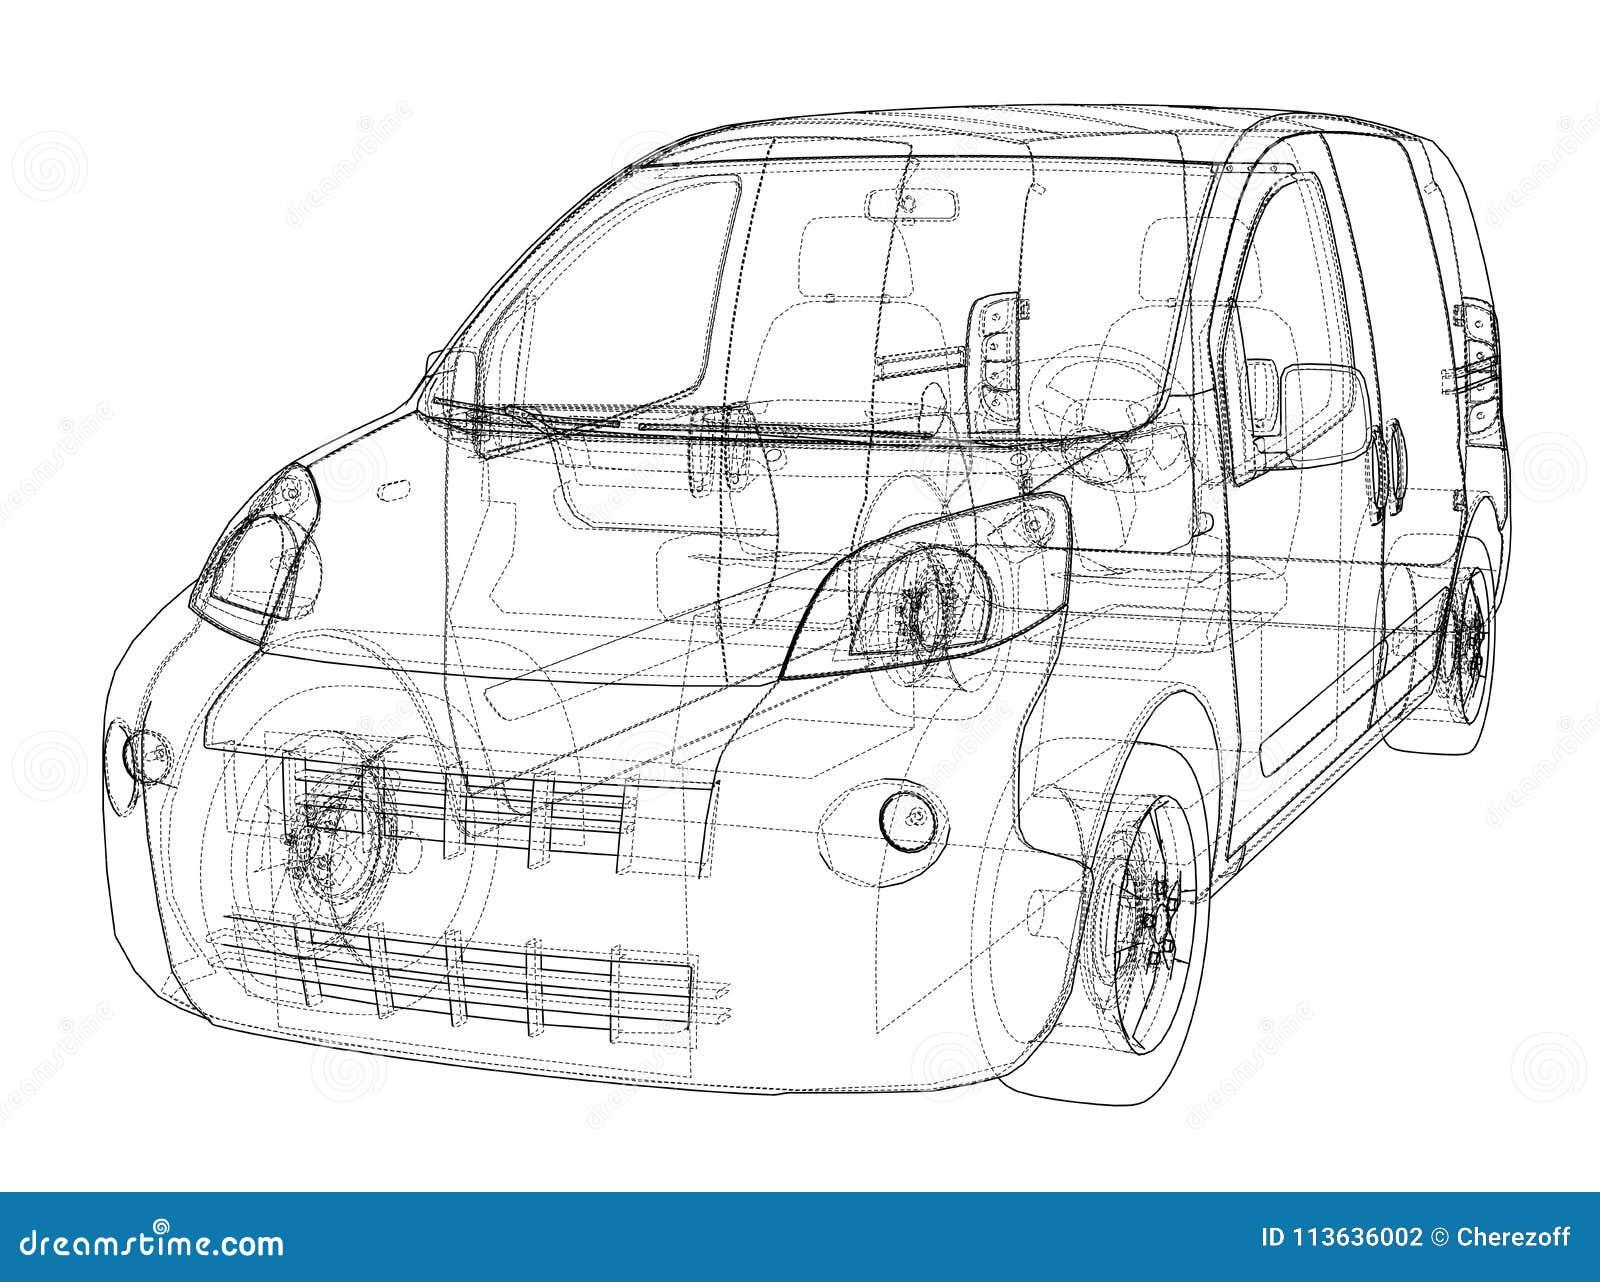 Concept car blueprint stock illustration  Illustration of